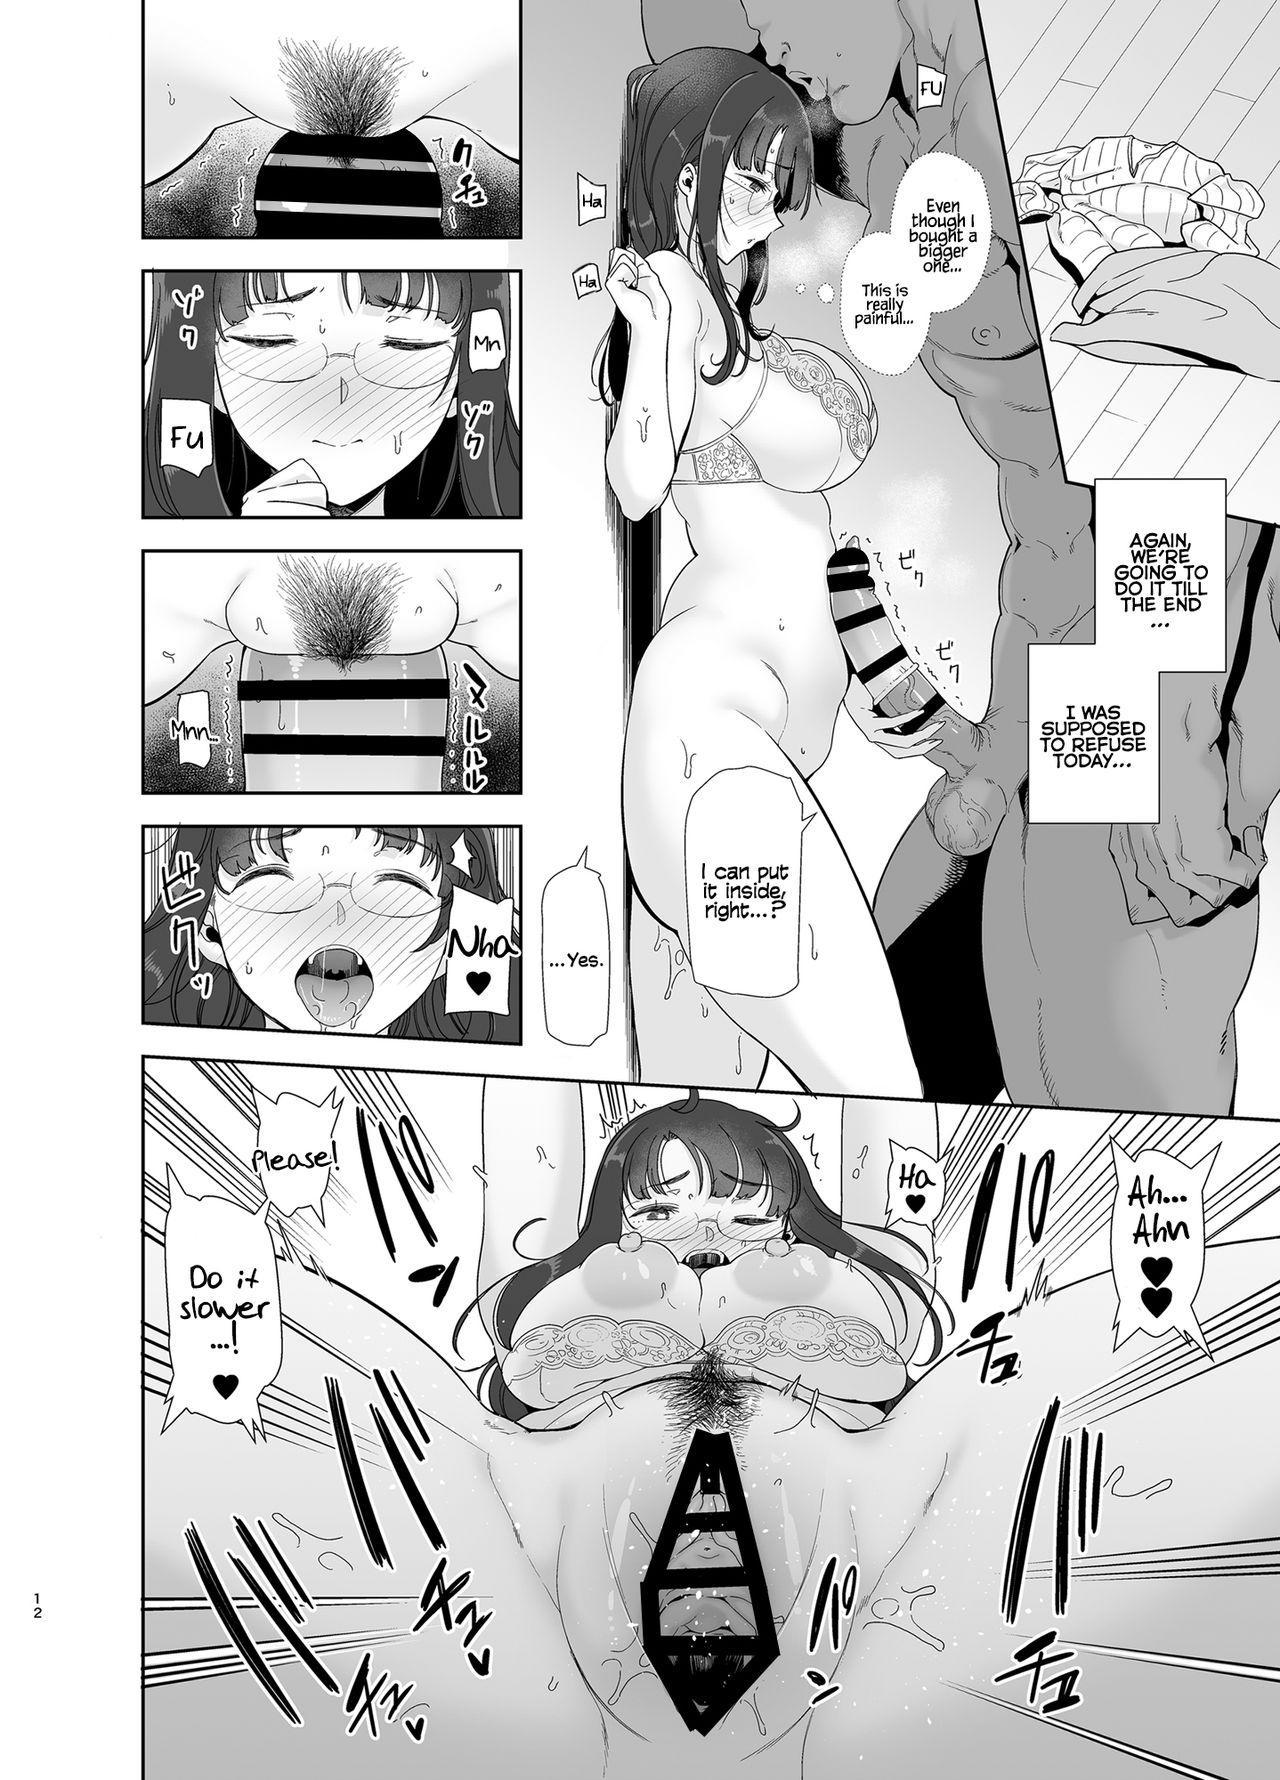 [DOLL PLAY (Kurosu Gatari)] Wild-shiki Nihonjin Tsuma no Netorikata Sono Ichi   Wild Method - How to Steal a Japanese Housewife - Part One [English] [Coffedrug] [Digital] 10